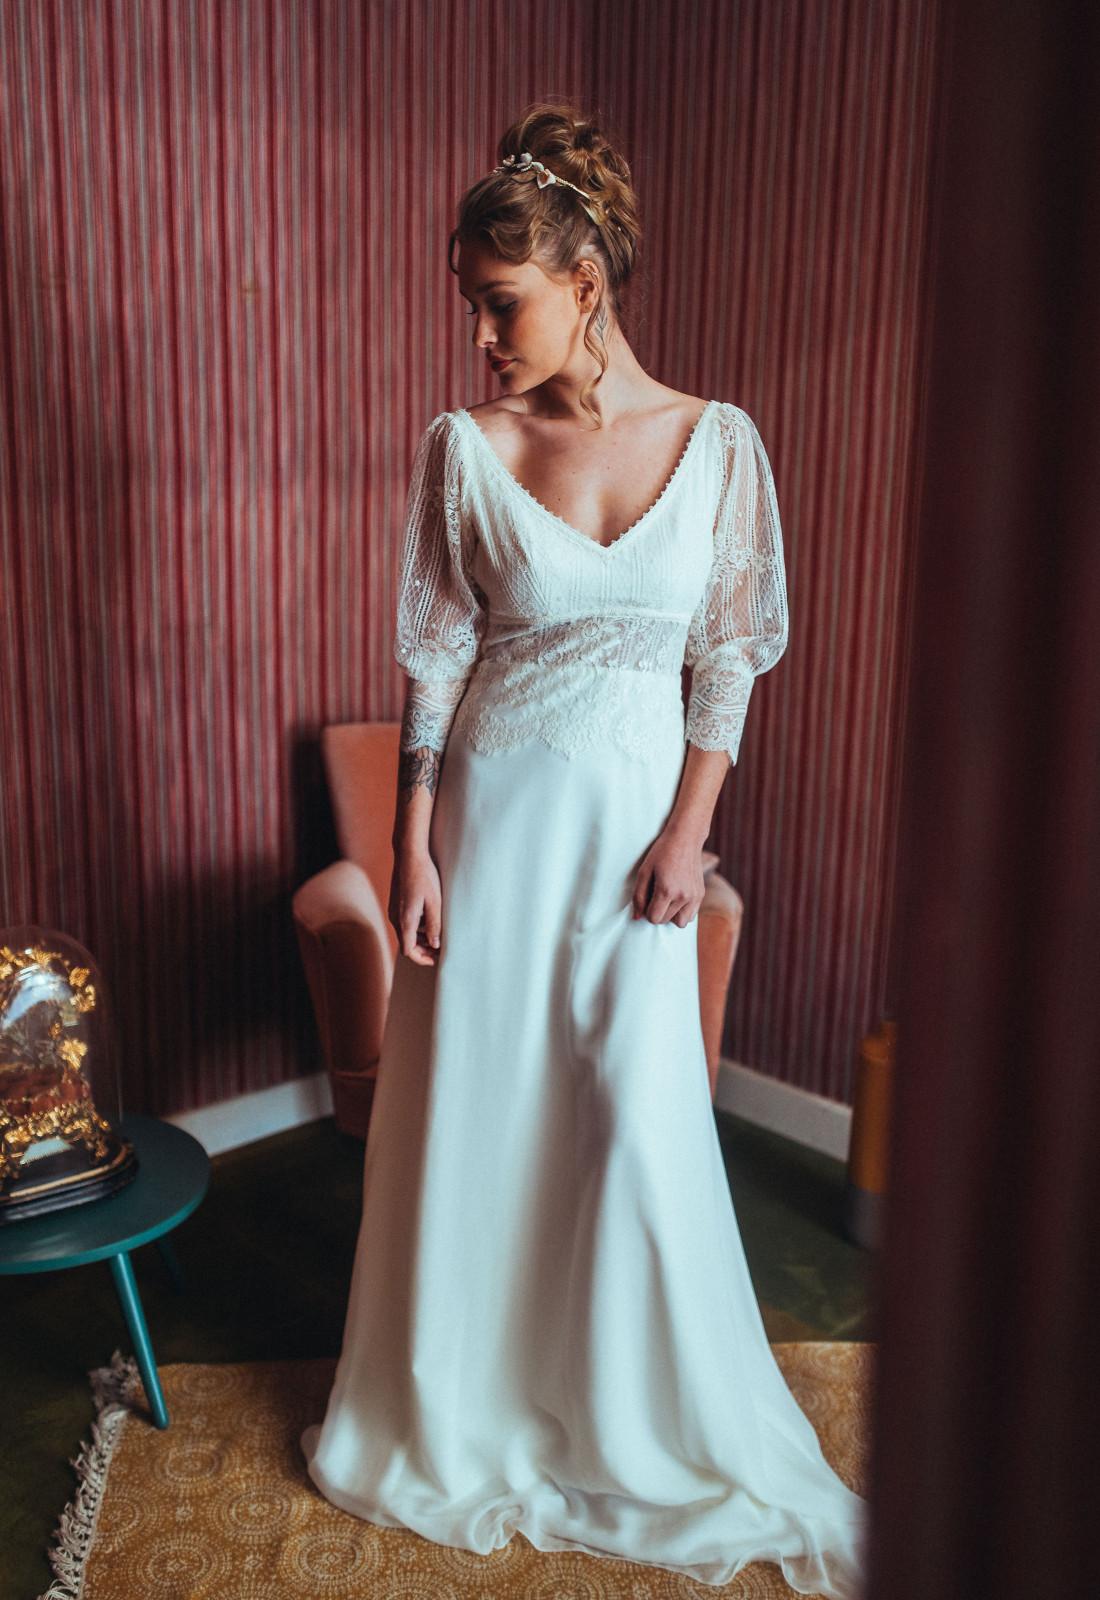 Robe de mariée rétro Chloé Elsa Gary, fluide. Caralys Mariage Nice 06